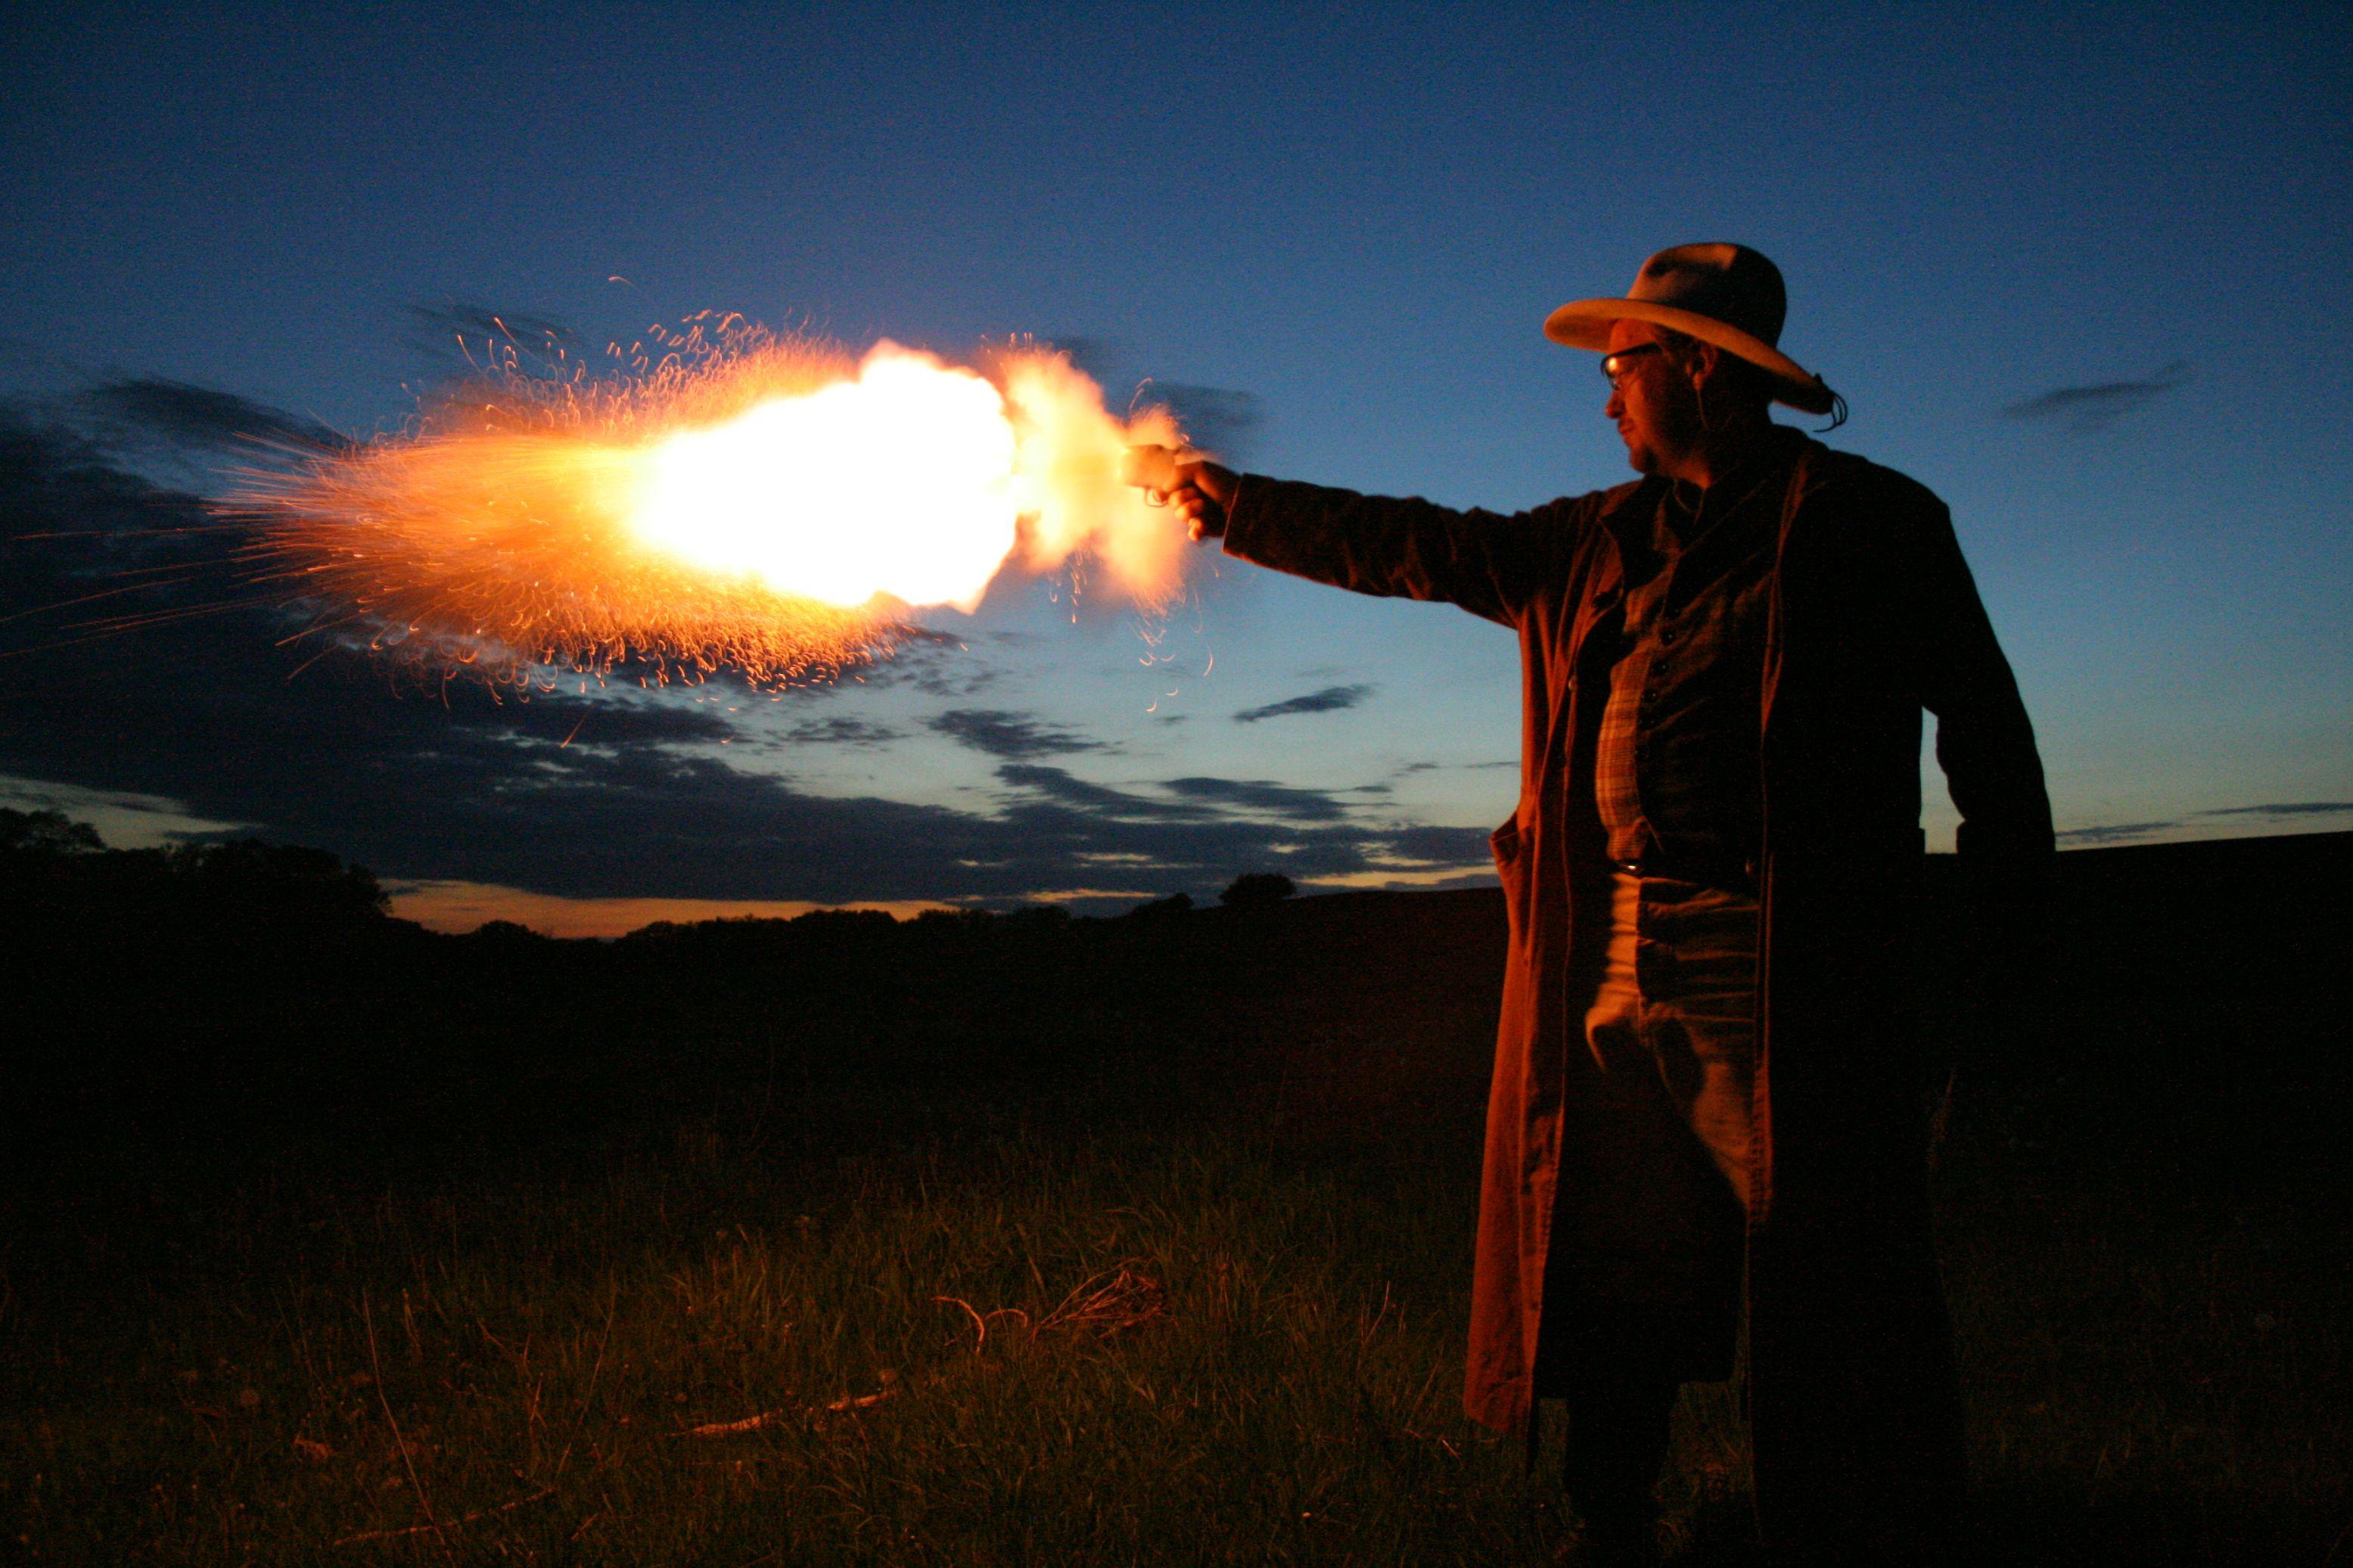 black powder gun night